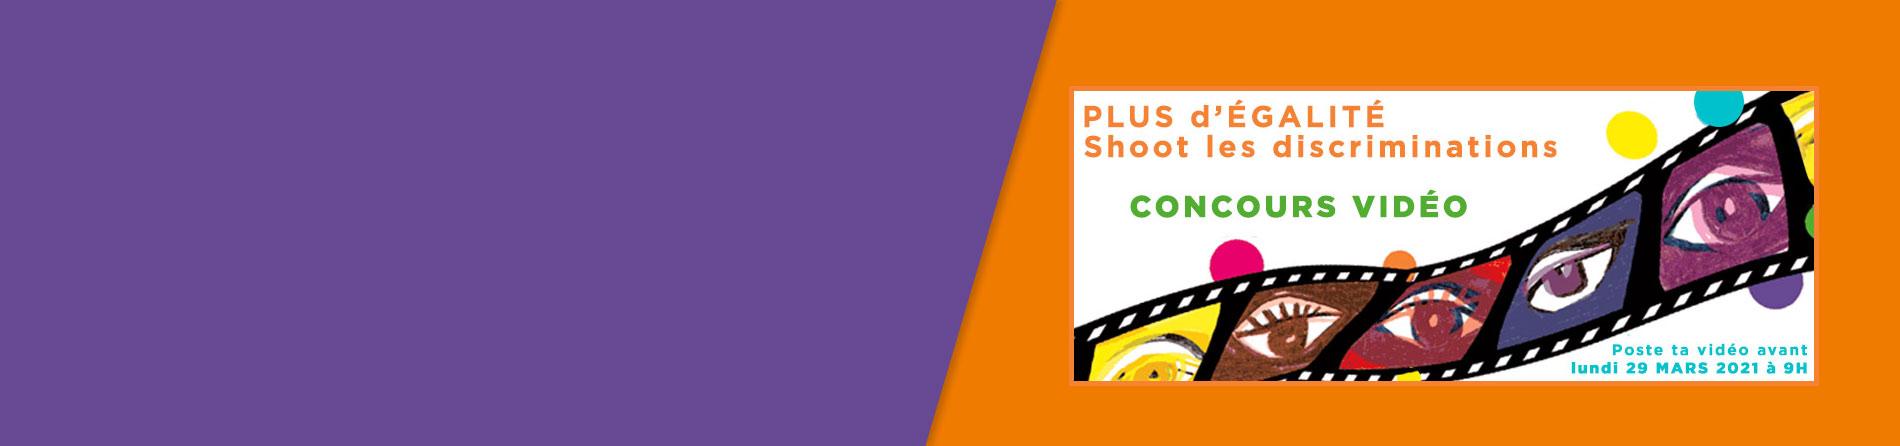 Pushshootld